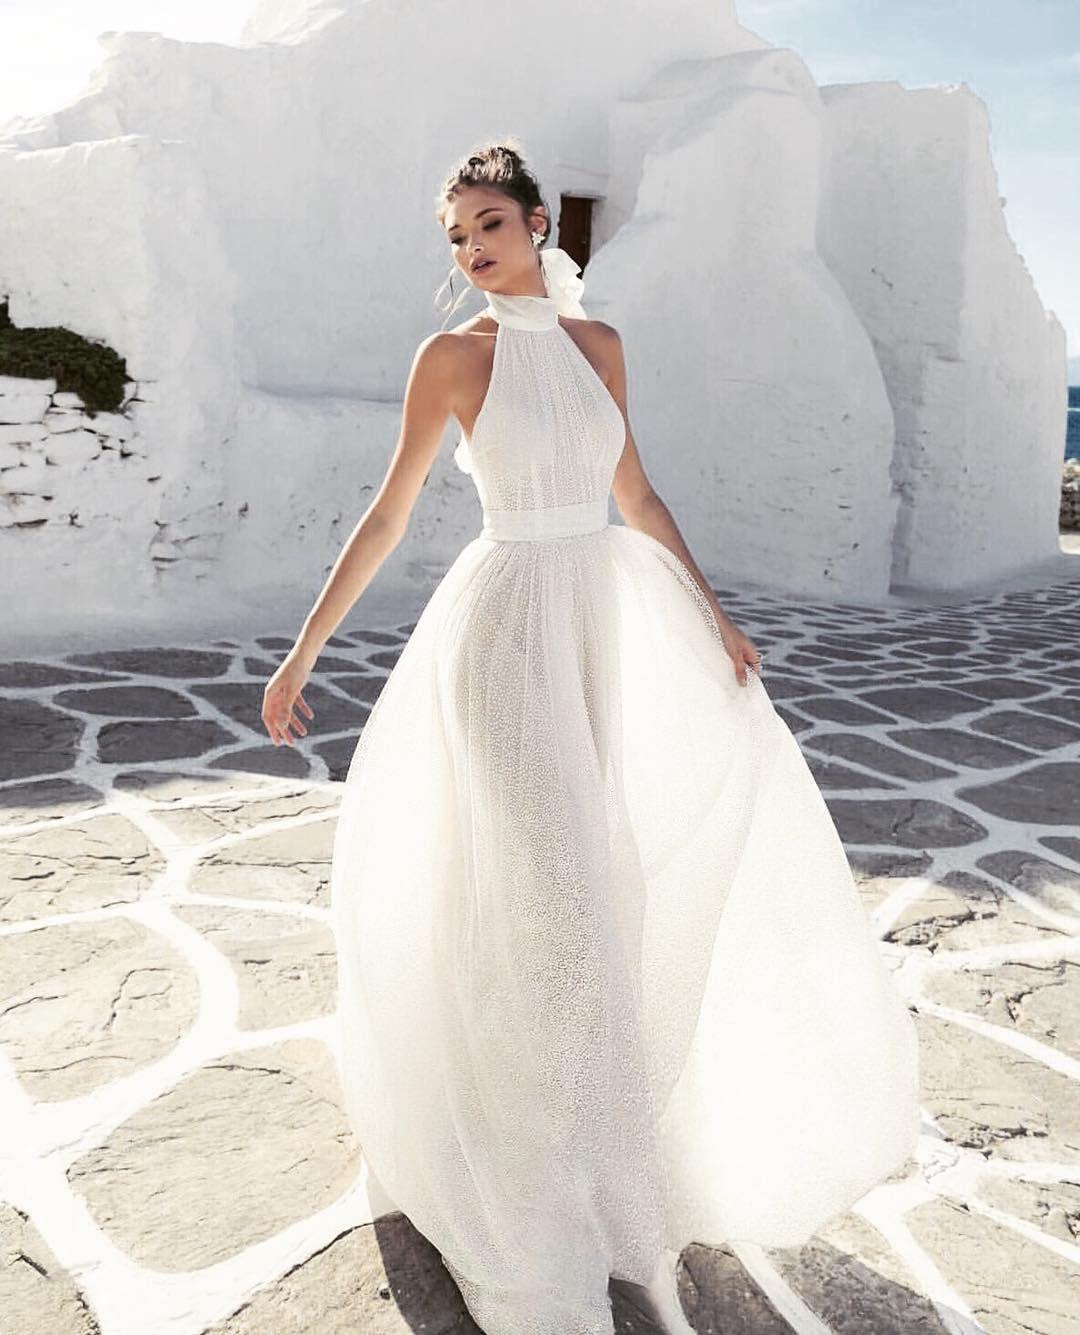 Mai Bridal Treasures On Instagram Summer Brides This Simple But Elegant Wedding Dress From Romanzo By Jul Wedding Dresses Ball Gowns Wedding Bridal Dresses [ 1335 x 1080 Pixel ]